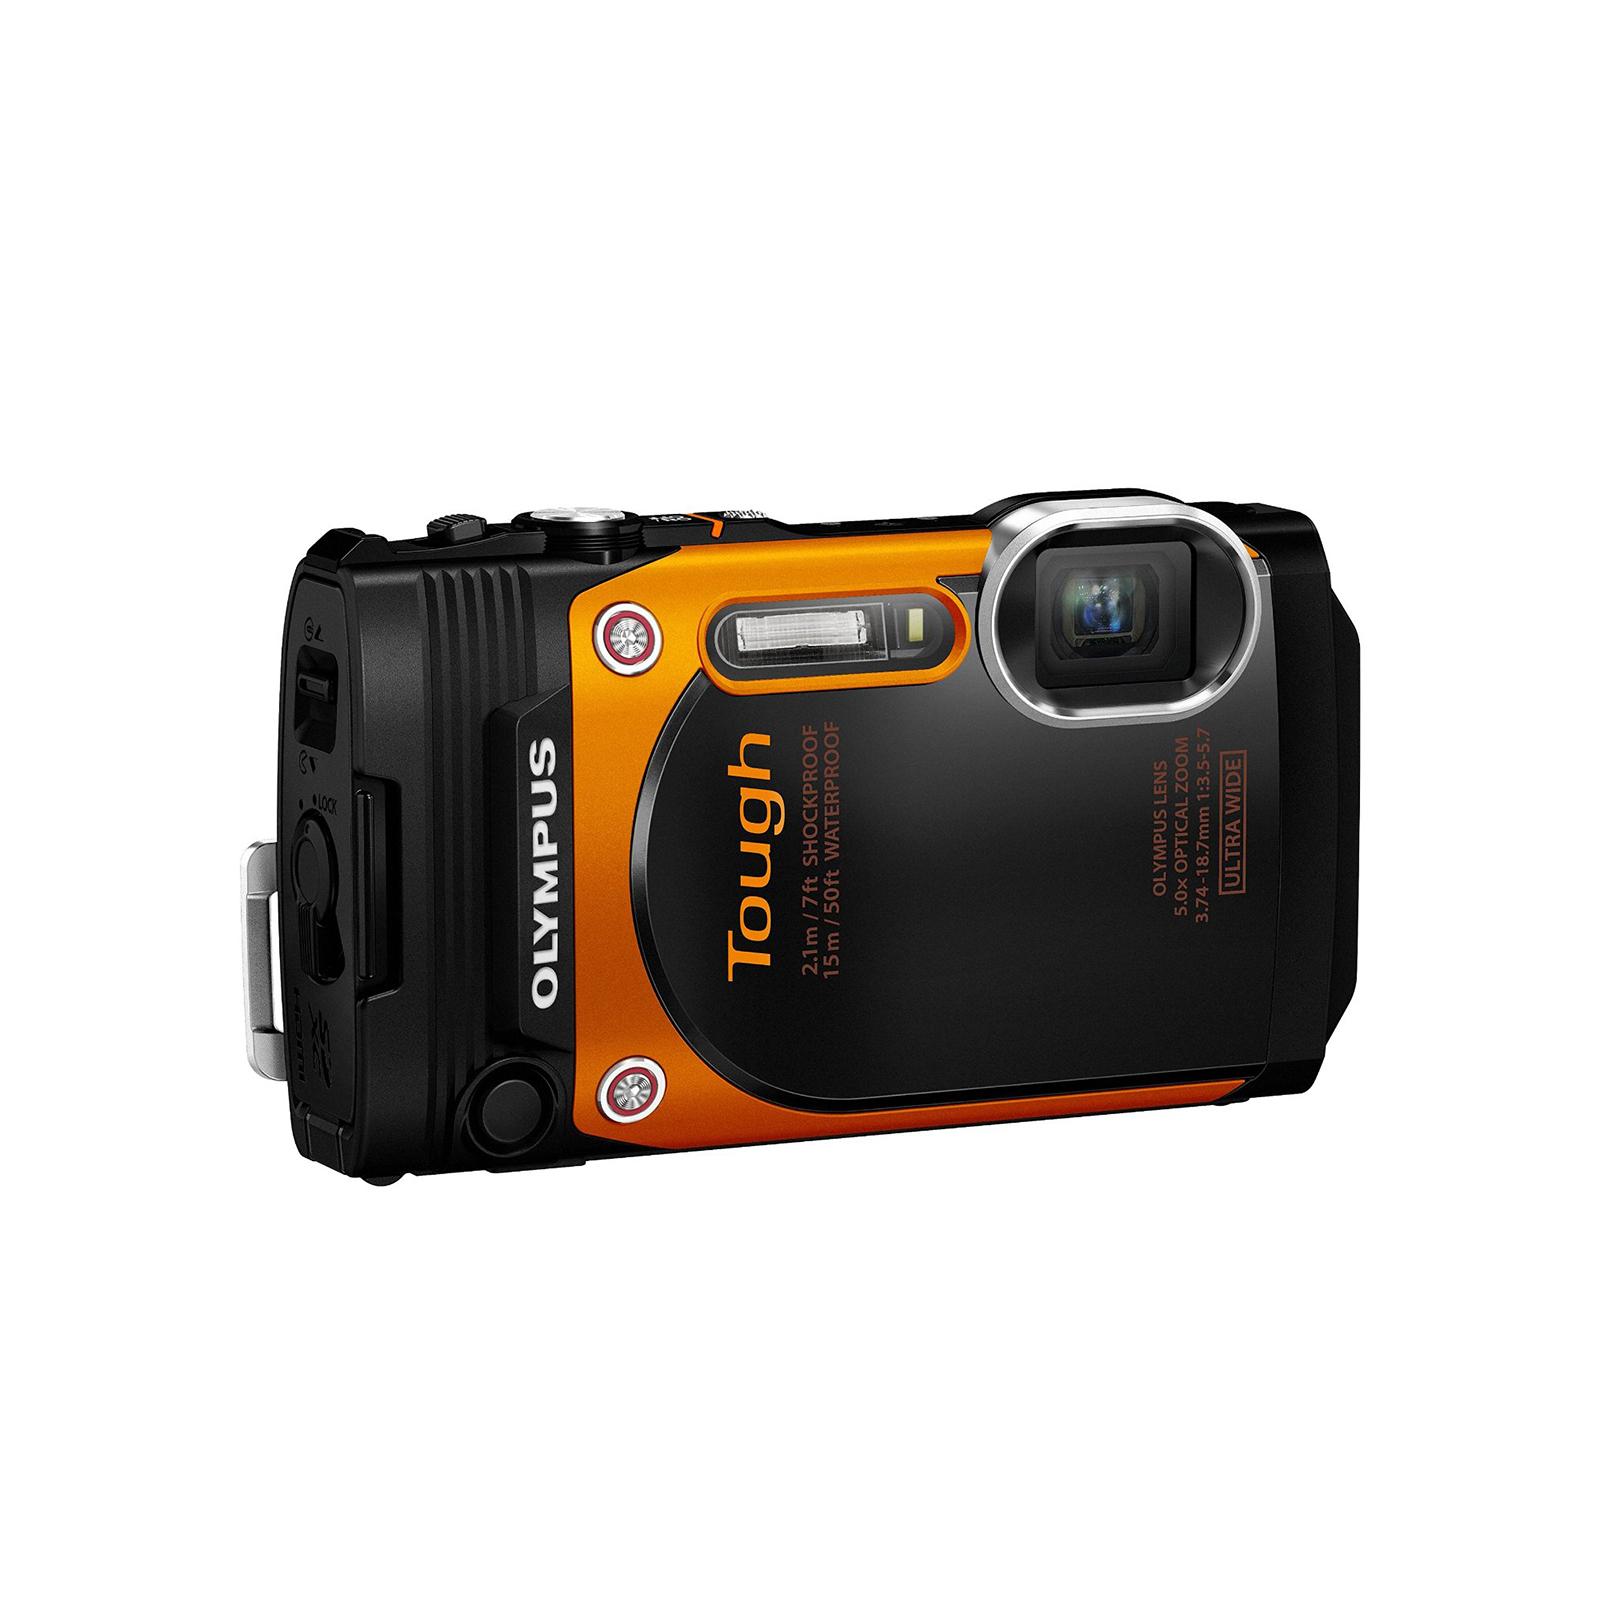 Цифровой фотоаппарат OLYMPUS TG-860 Orange (Waterproof - 15m; iHS; Wi-Fi) (V104170OE000) изображение 3